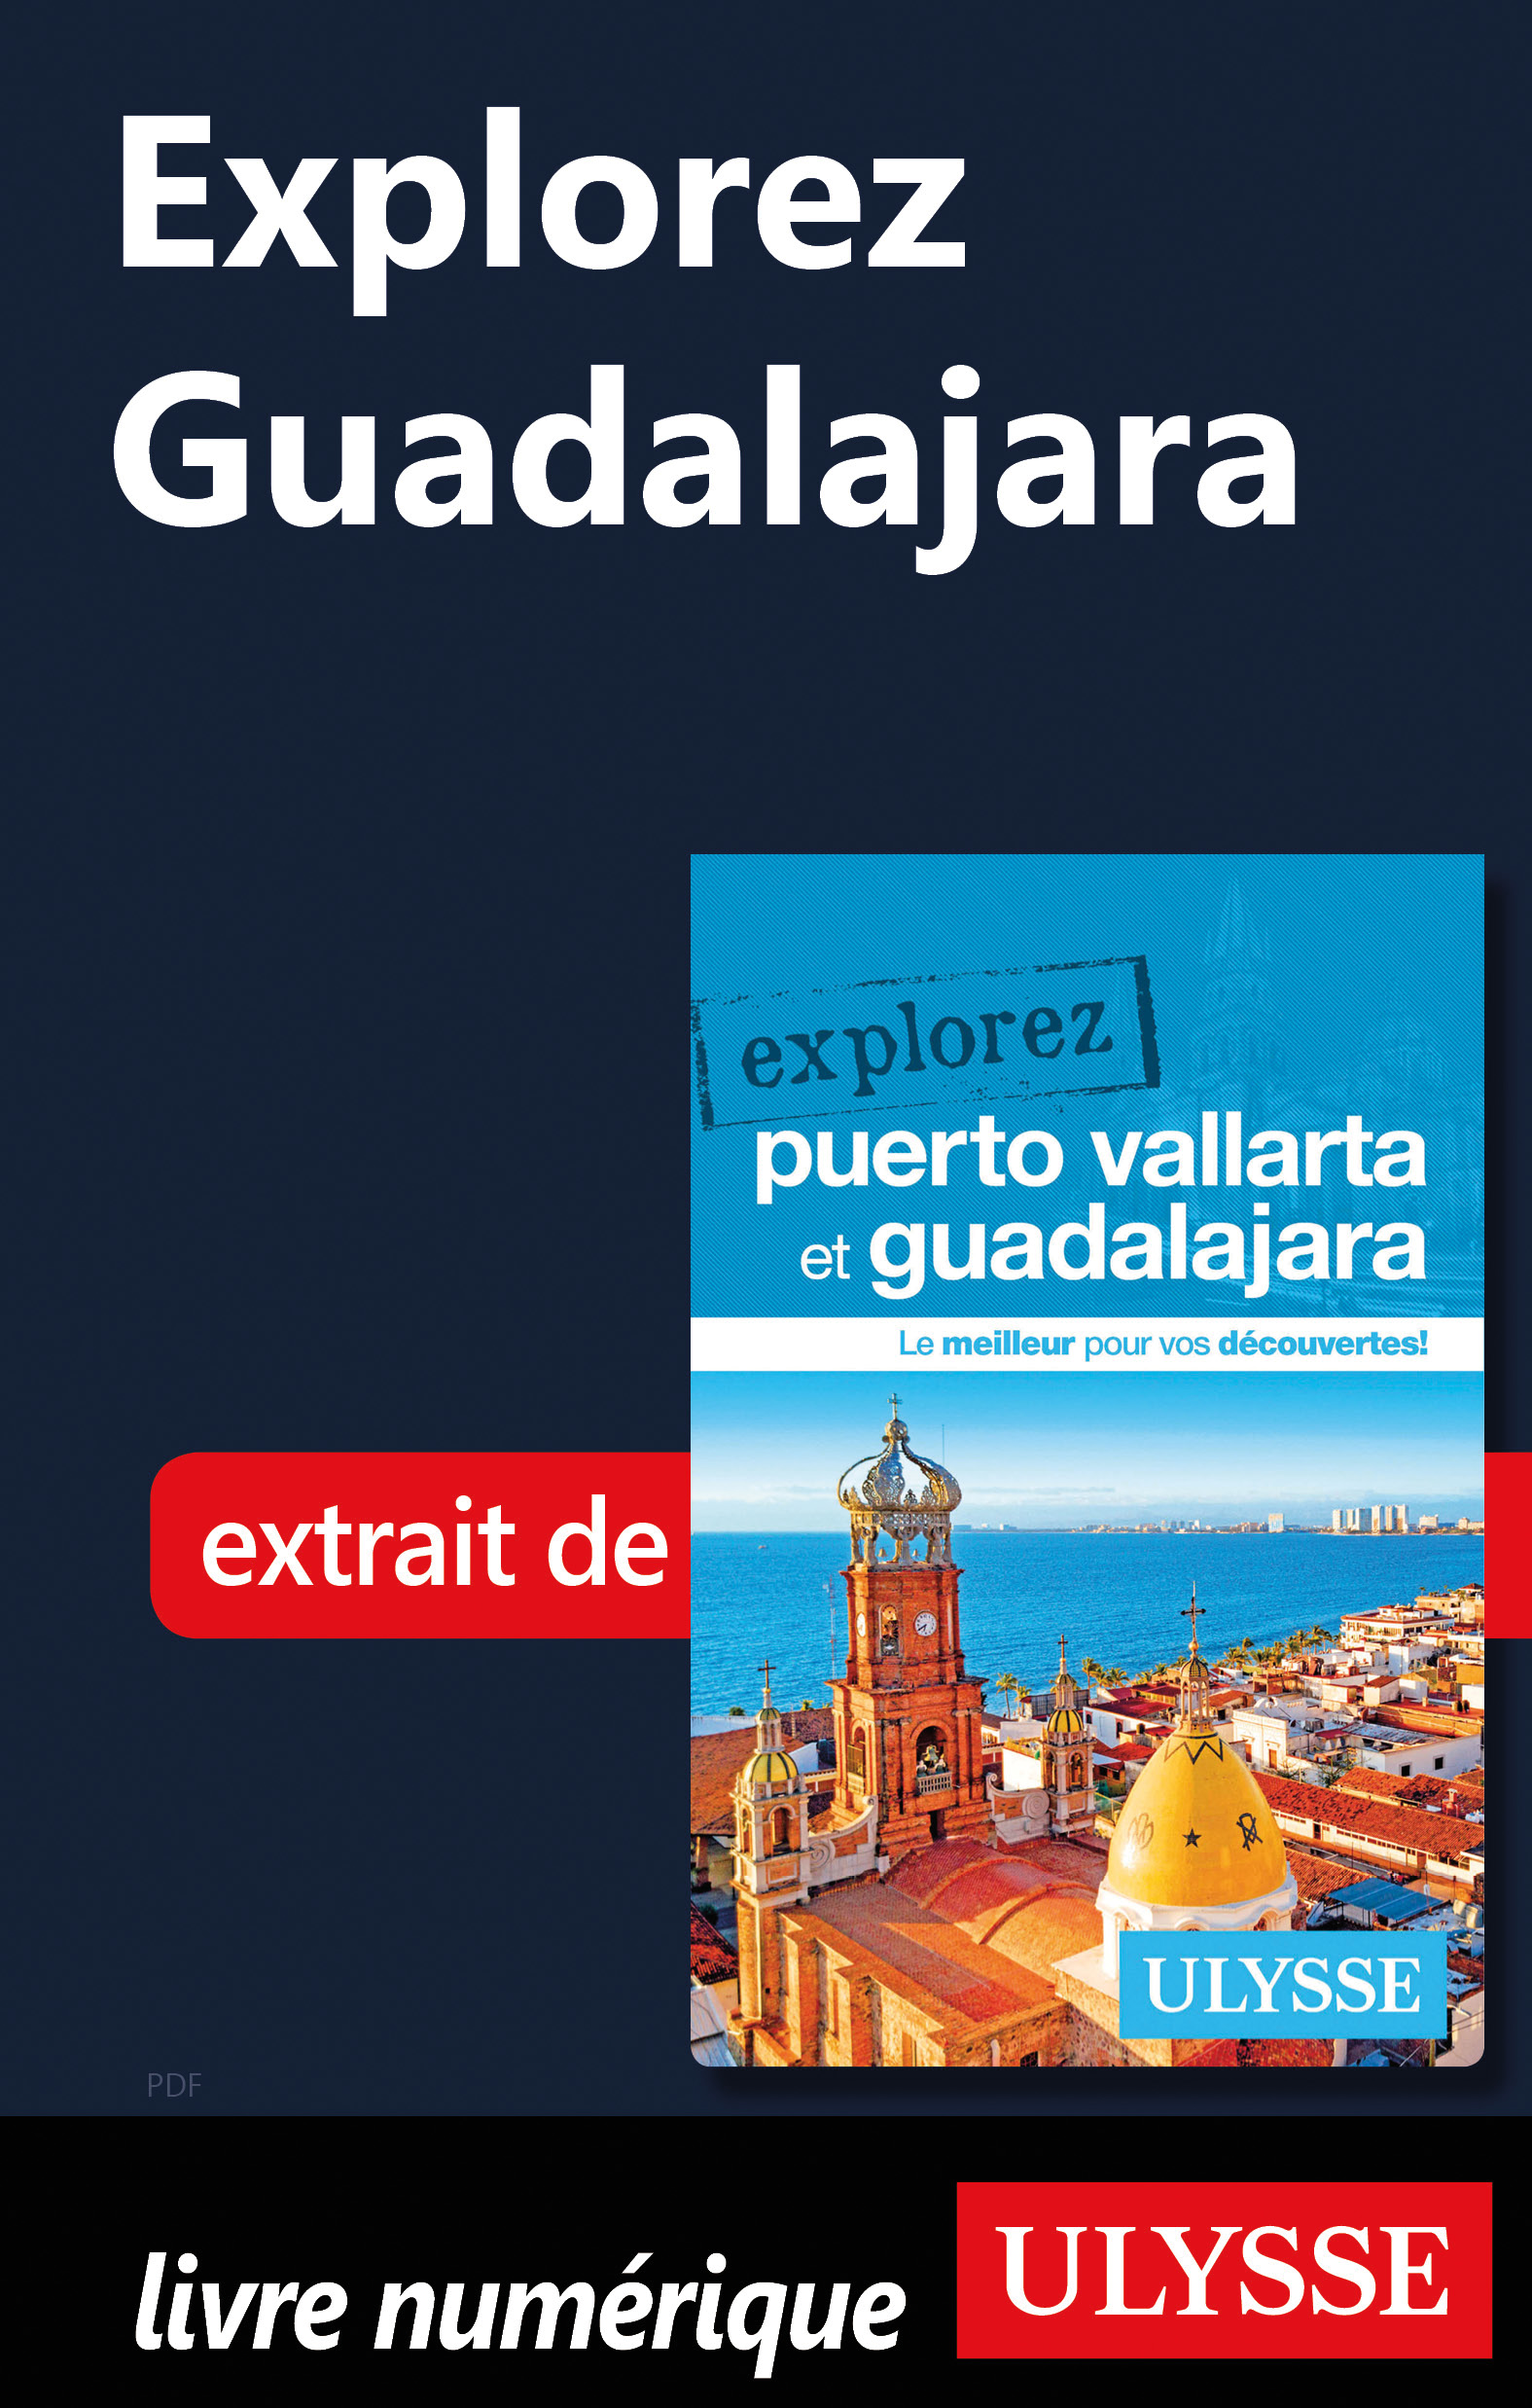 Explorez Guadalajara